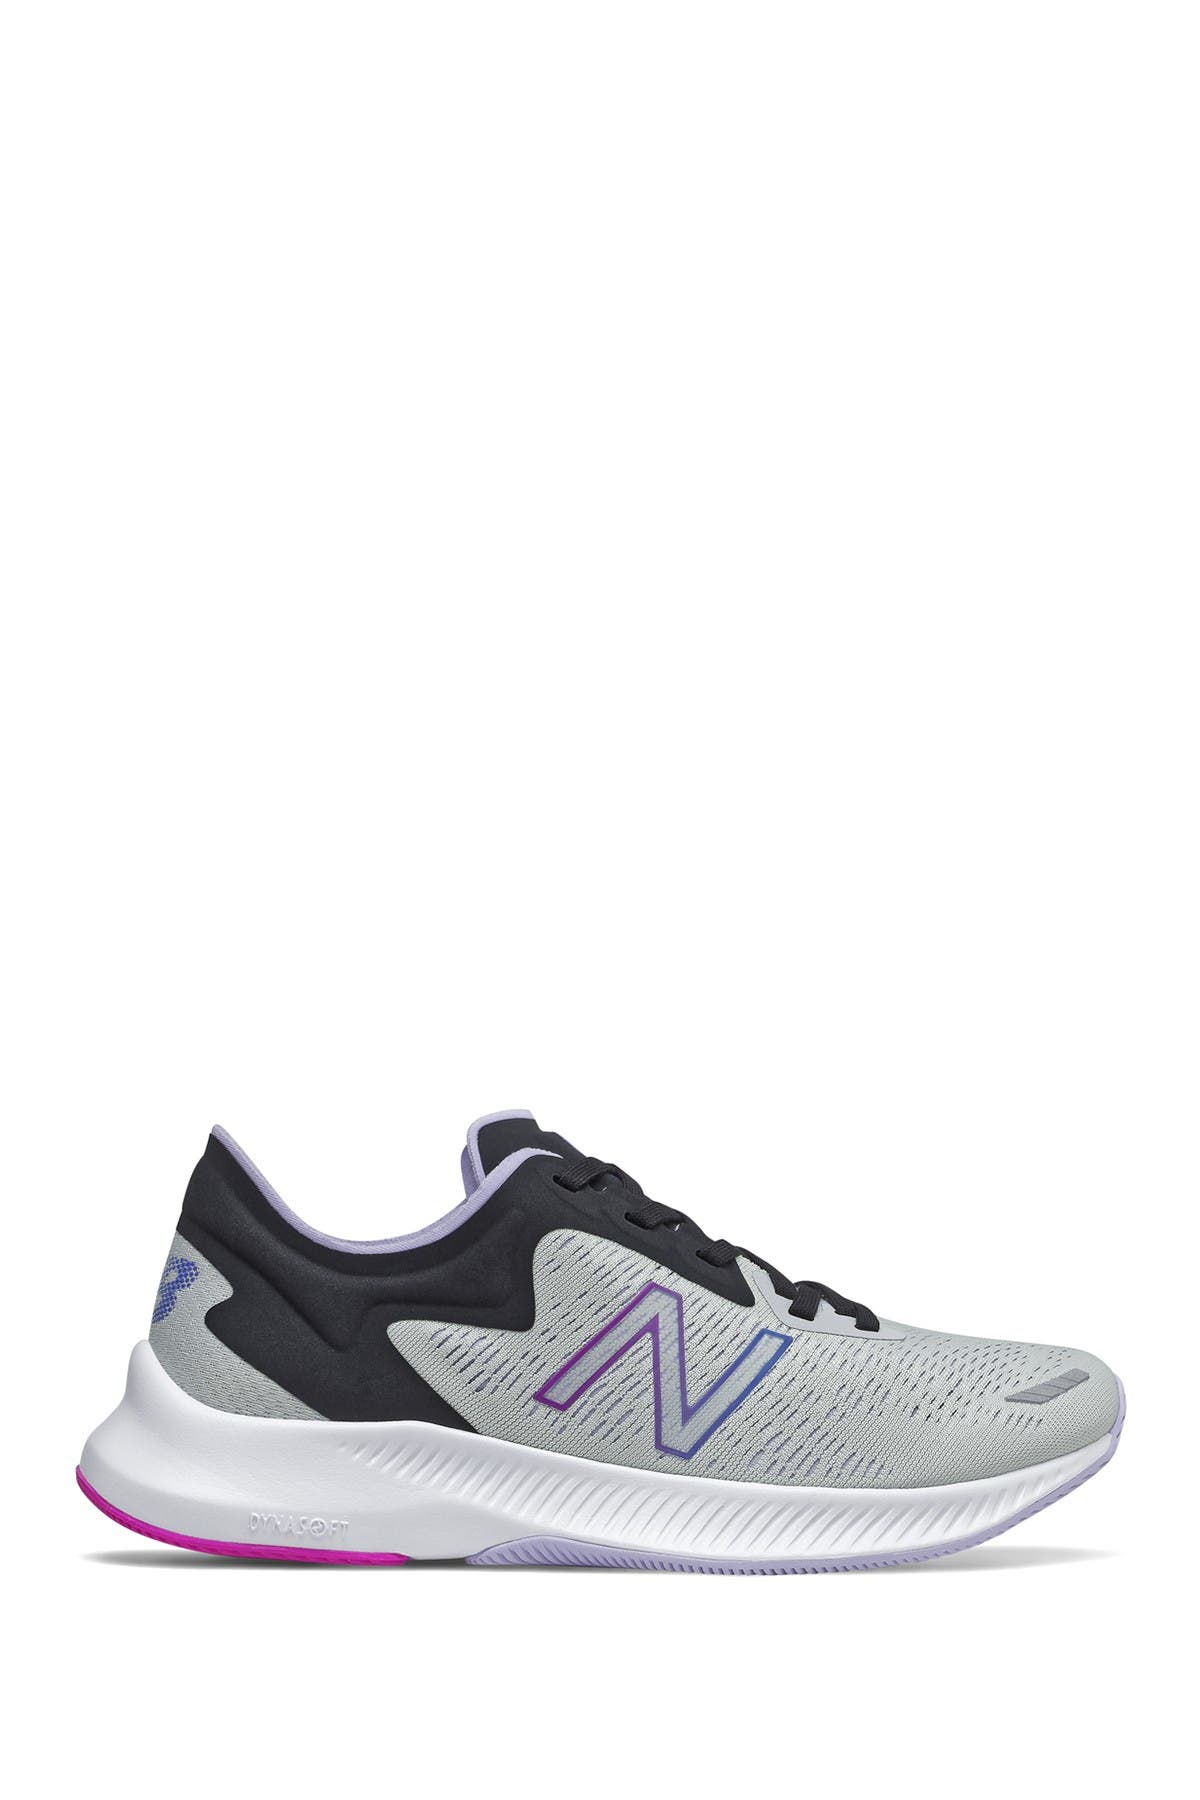 Image of New Balance Pesu Athletic Sneaker